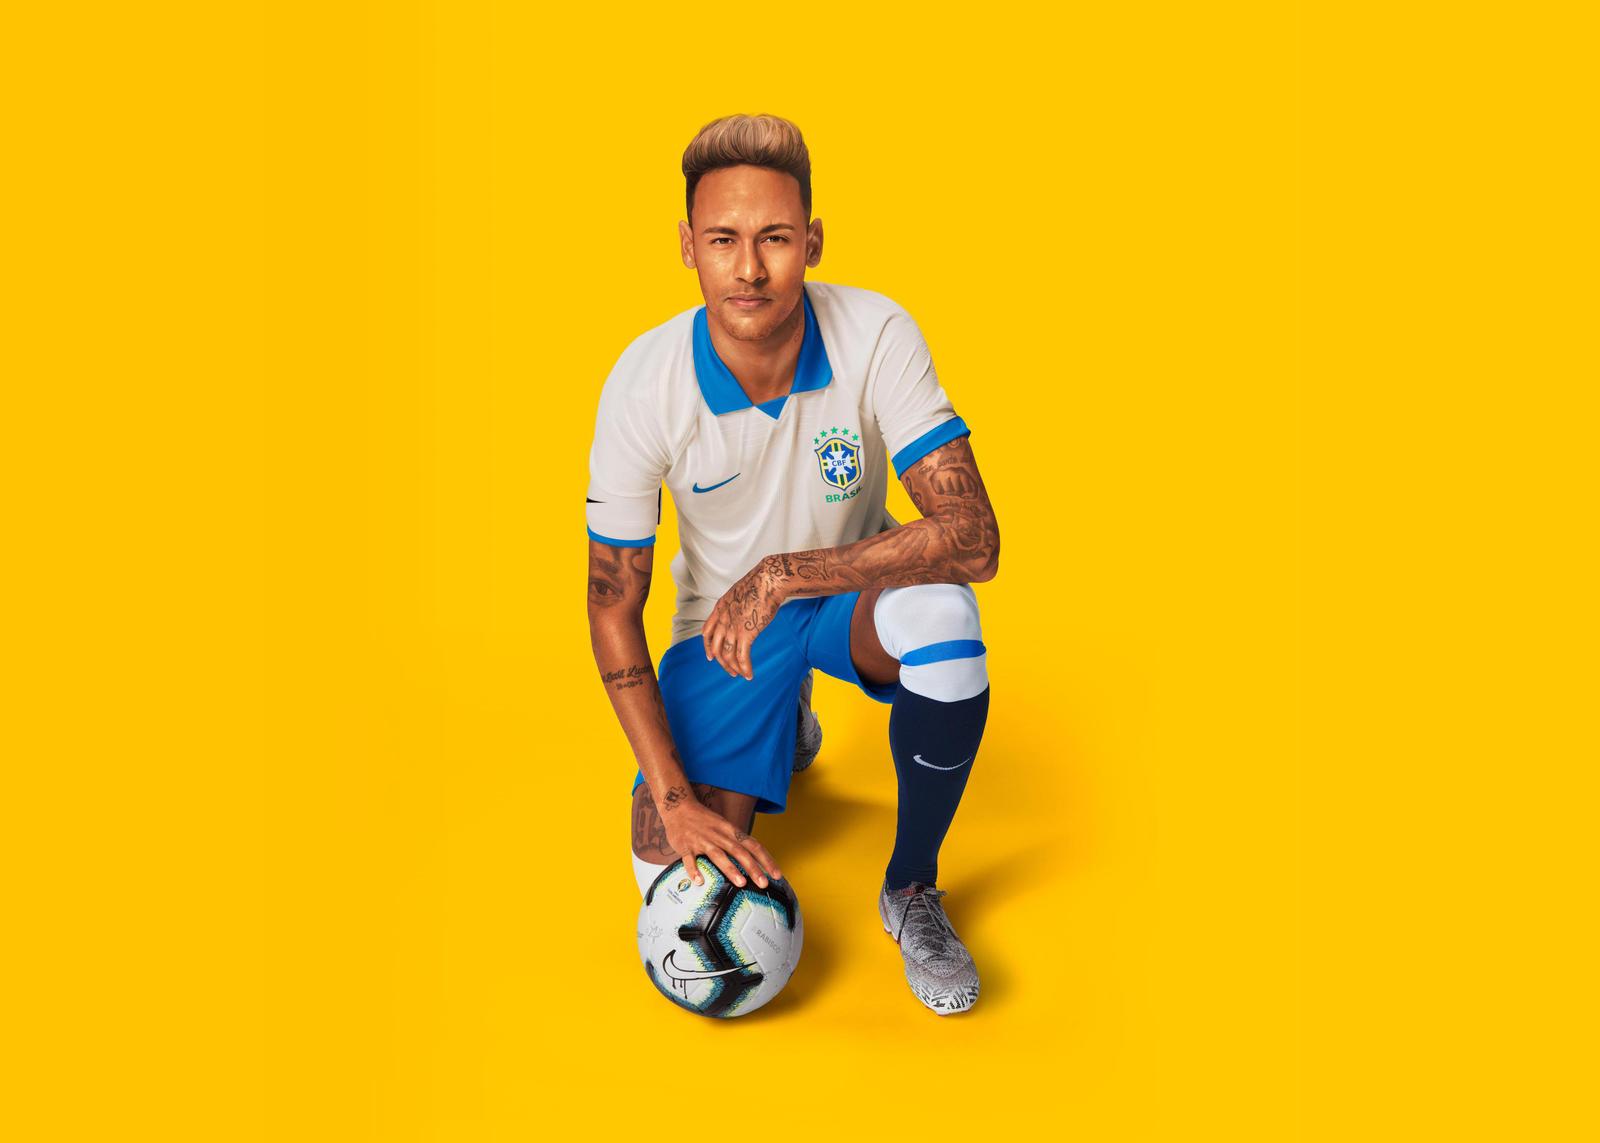 Nike 2019-20 Brasil Copa America 100th Anniversary Jersey Seleção Brasileira Collection 1